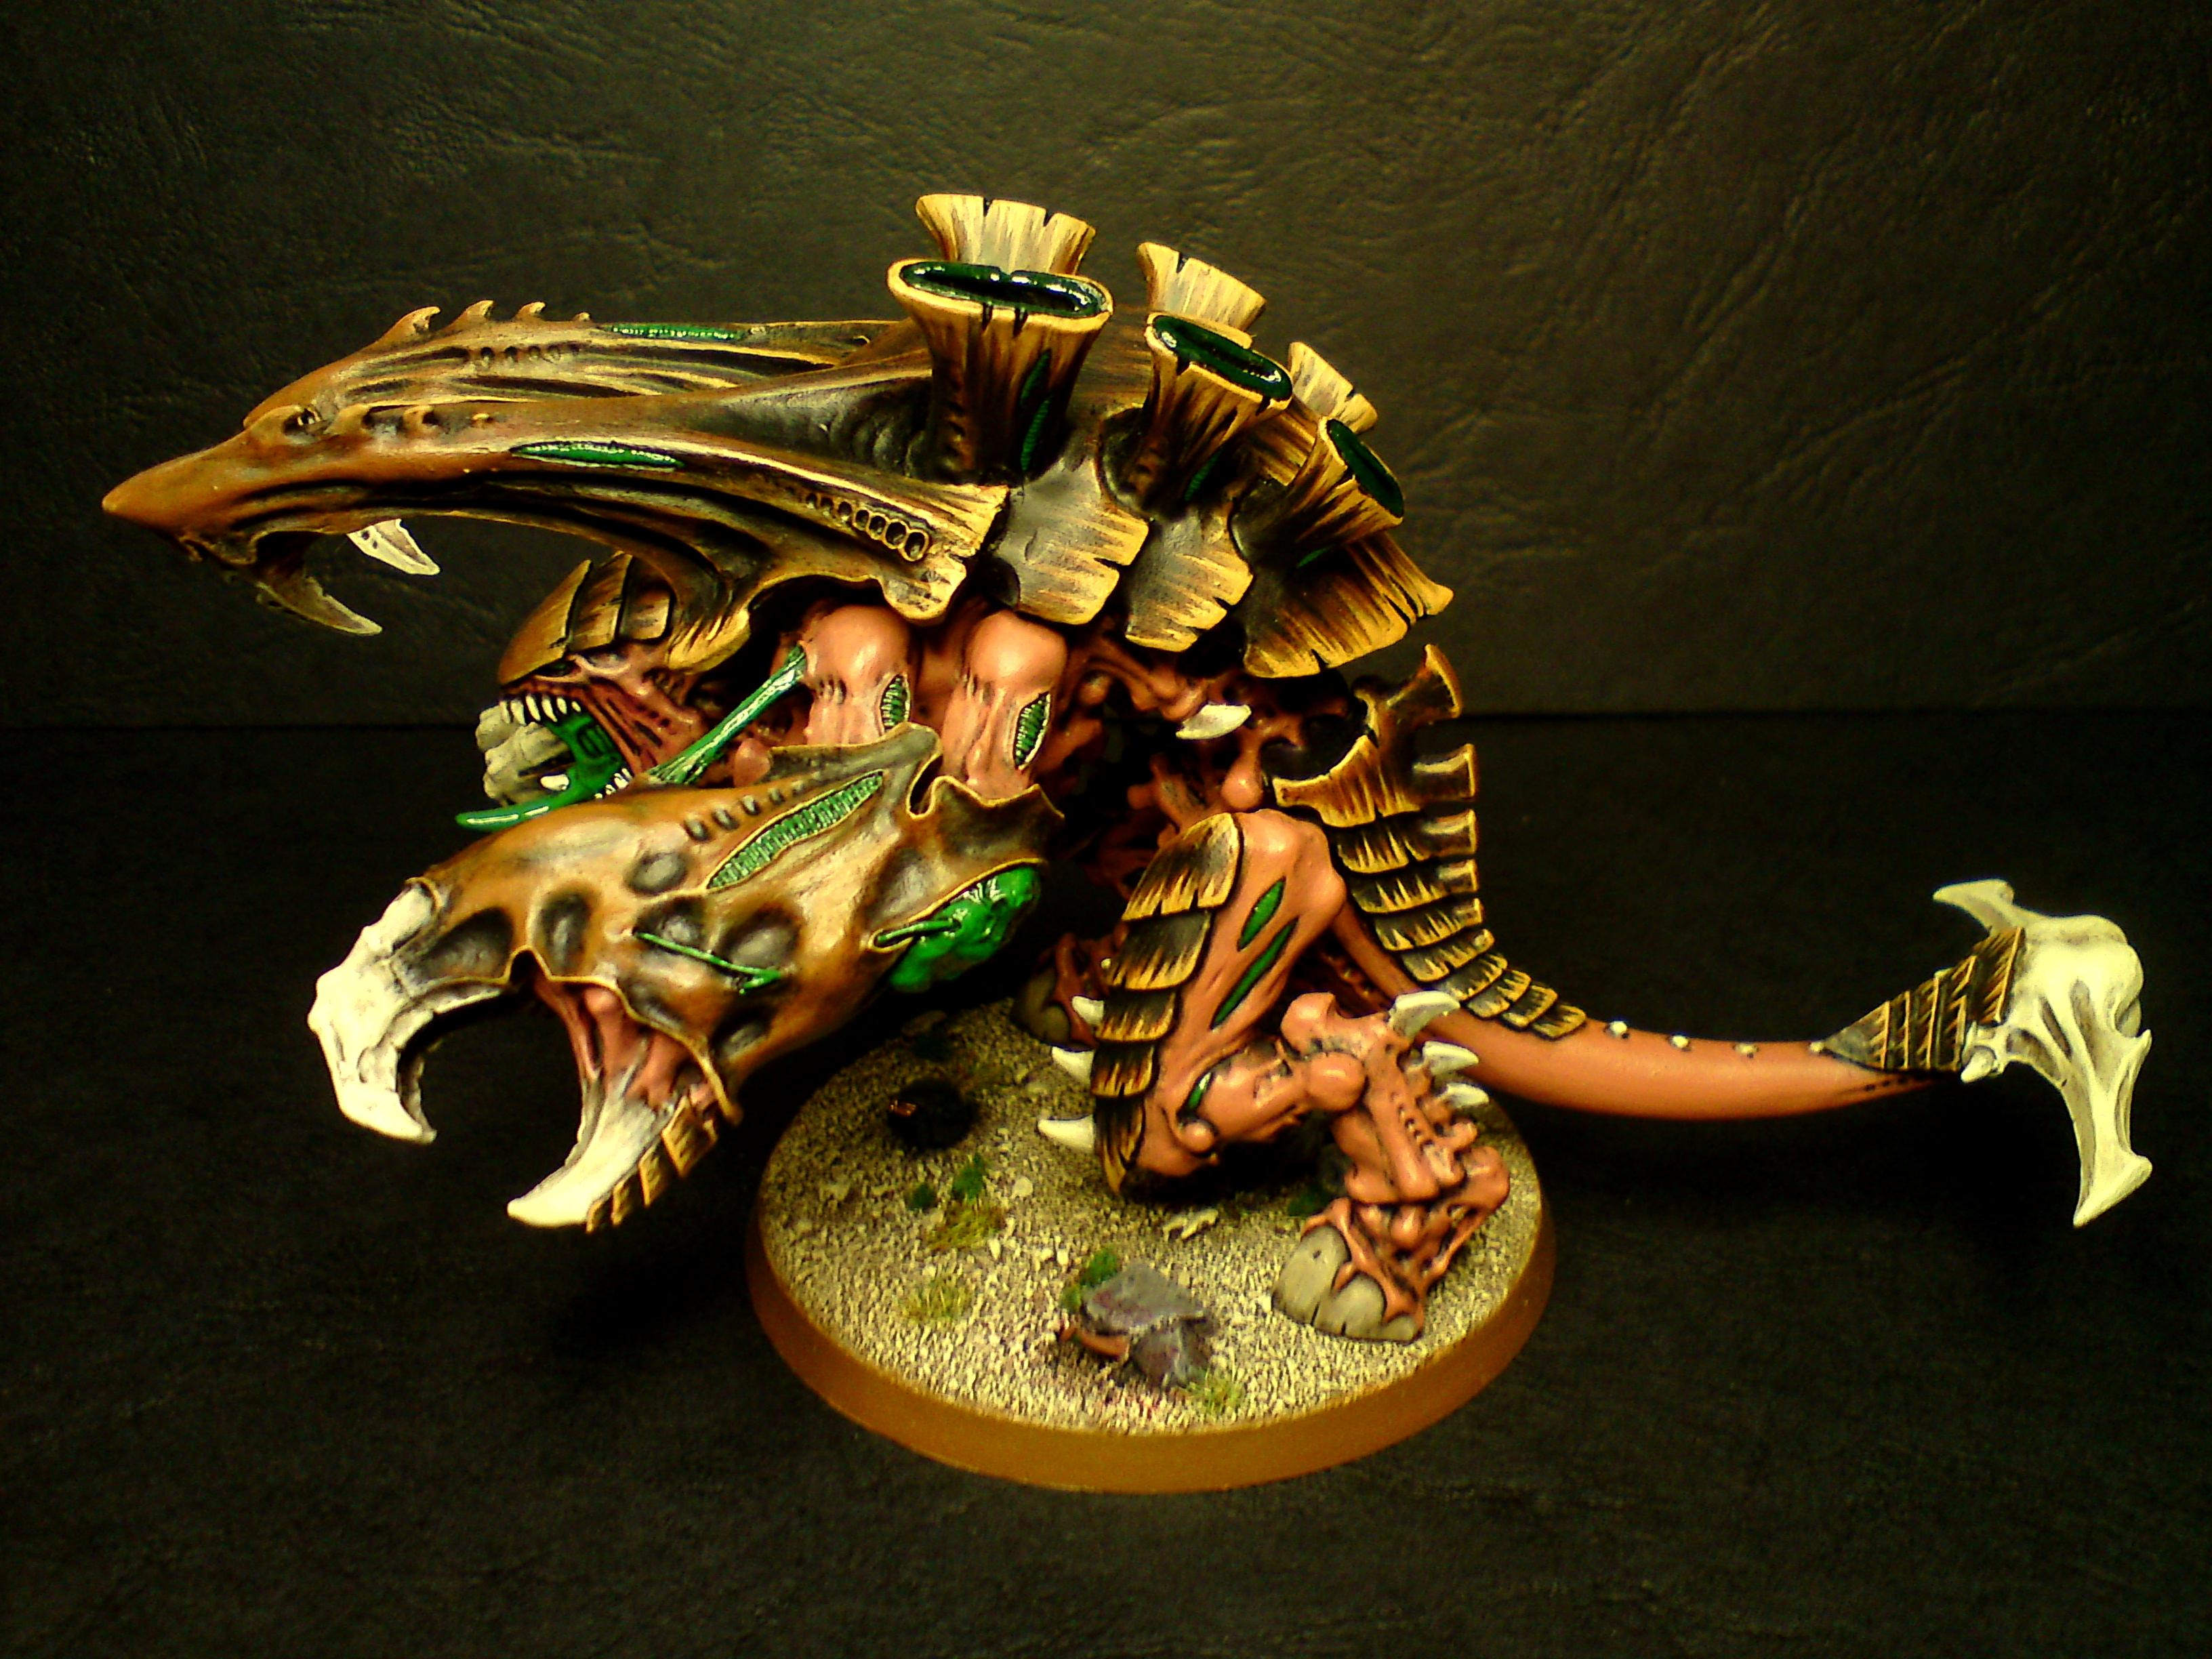 Carnifex, Forge World, Stone Crusher, Tyranids, Warhammer 40,000